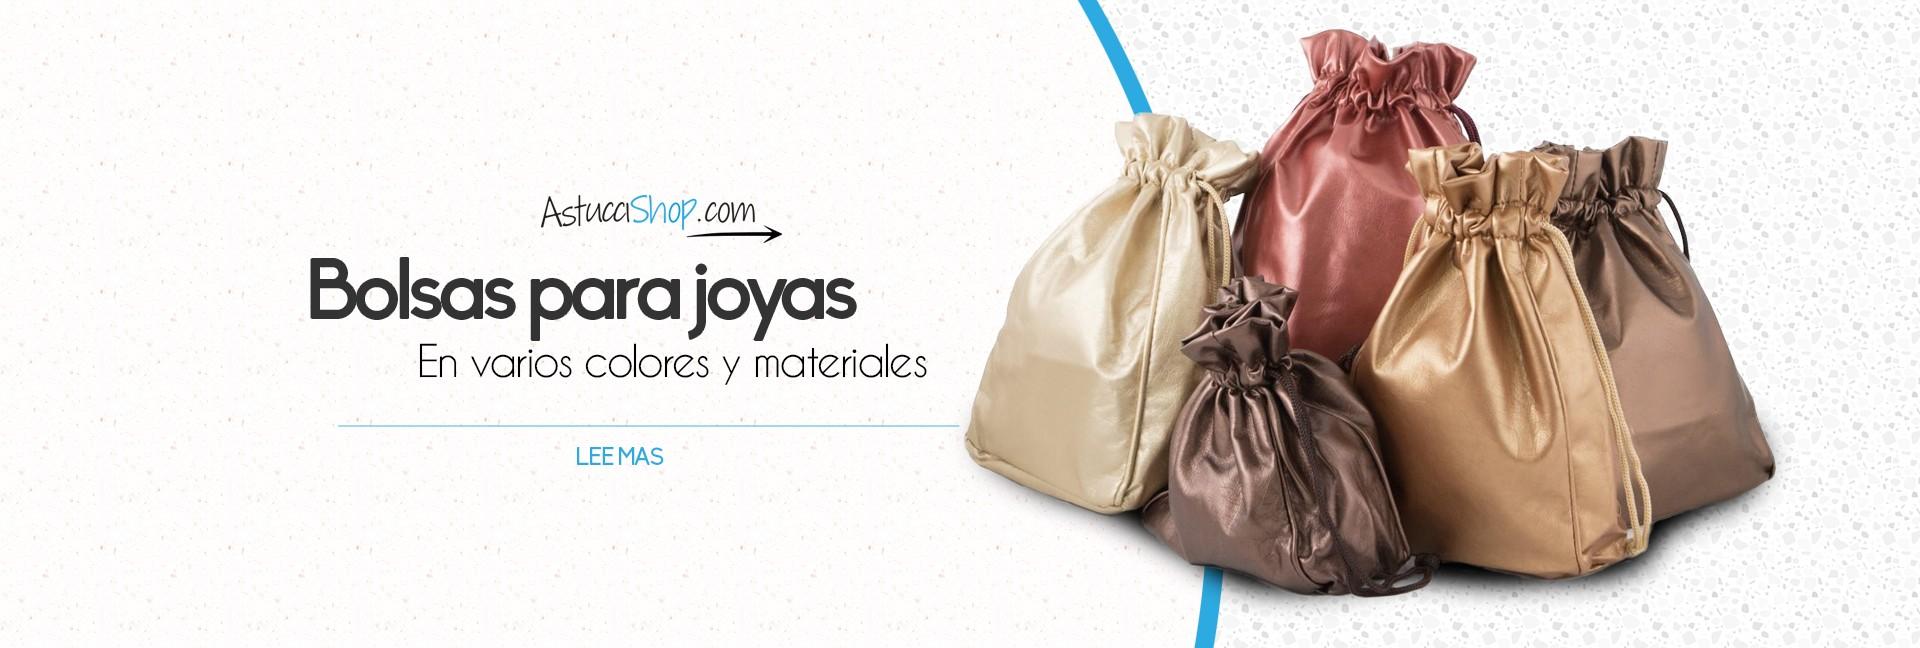 bolsas para joyas